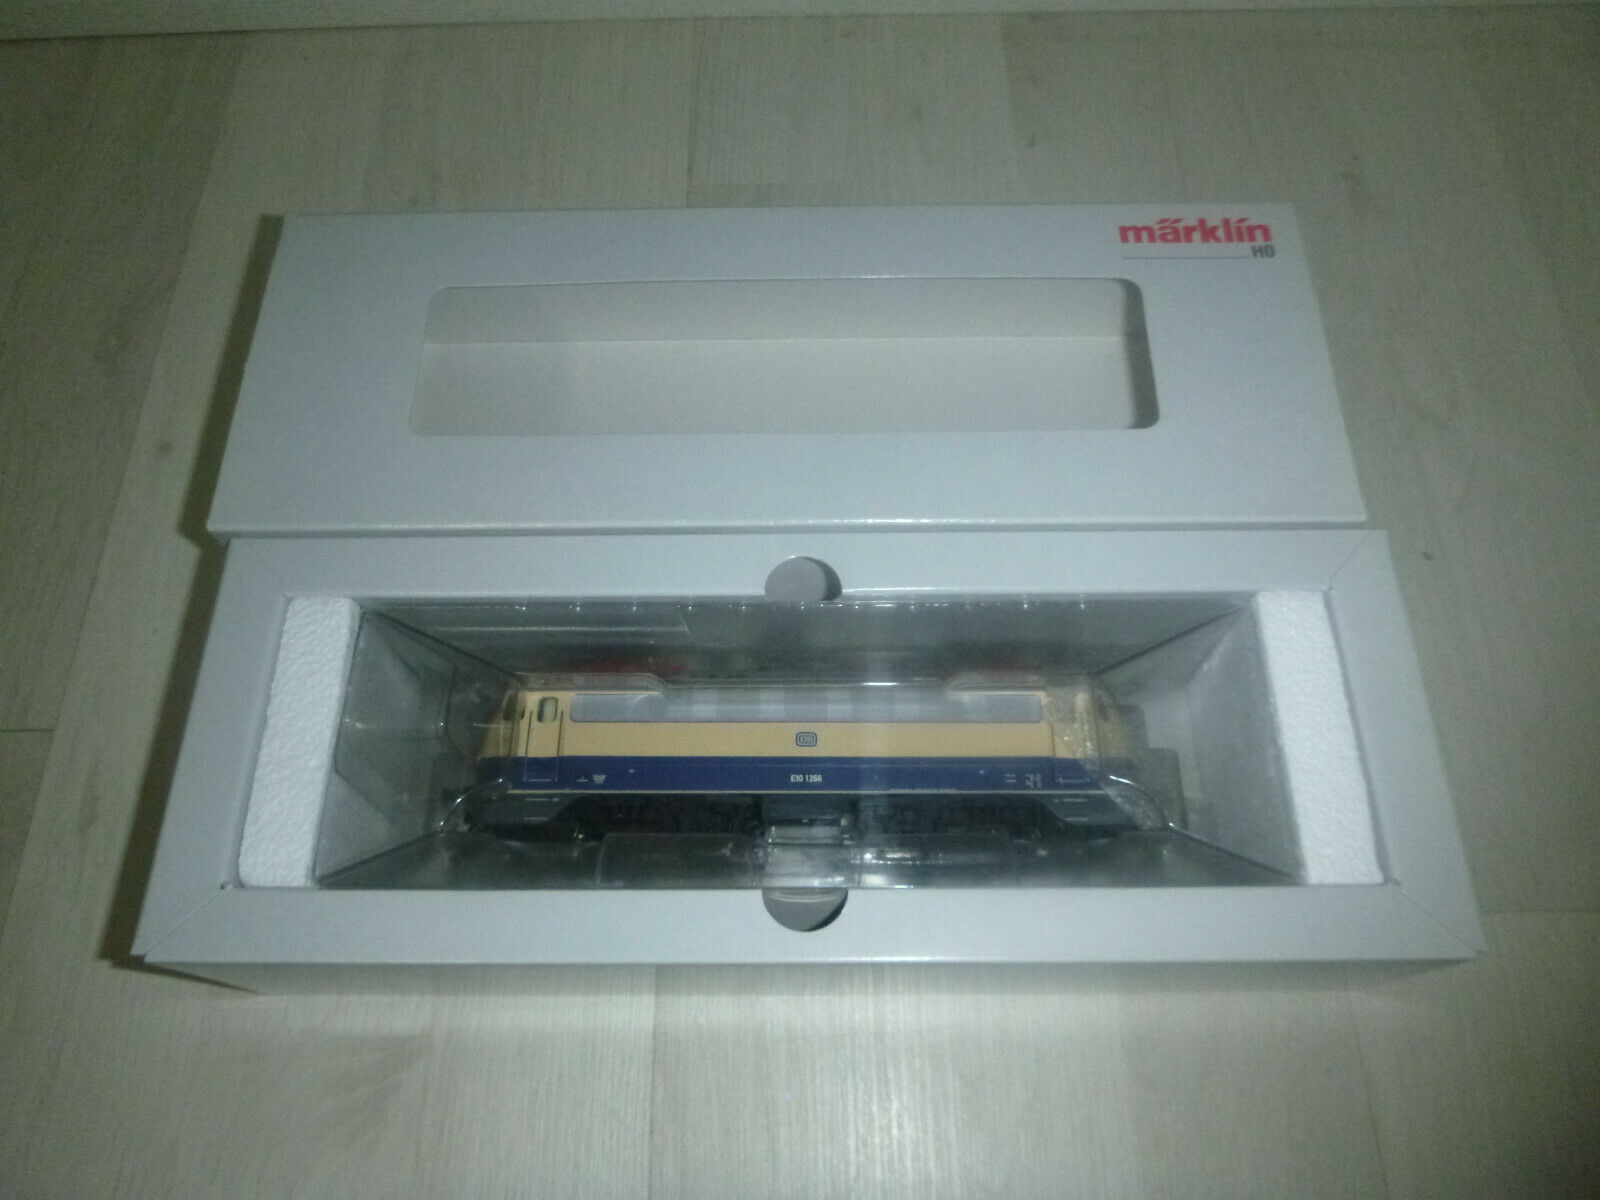 Märklin 39121 Locomotive Électrique E 10.12 Rheingold Top